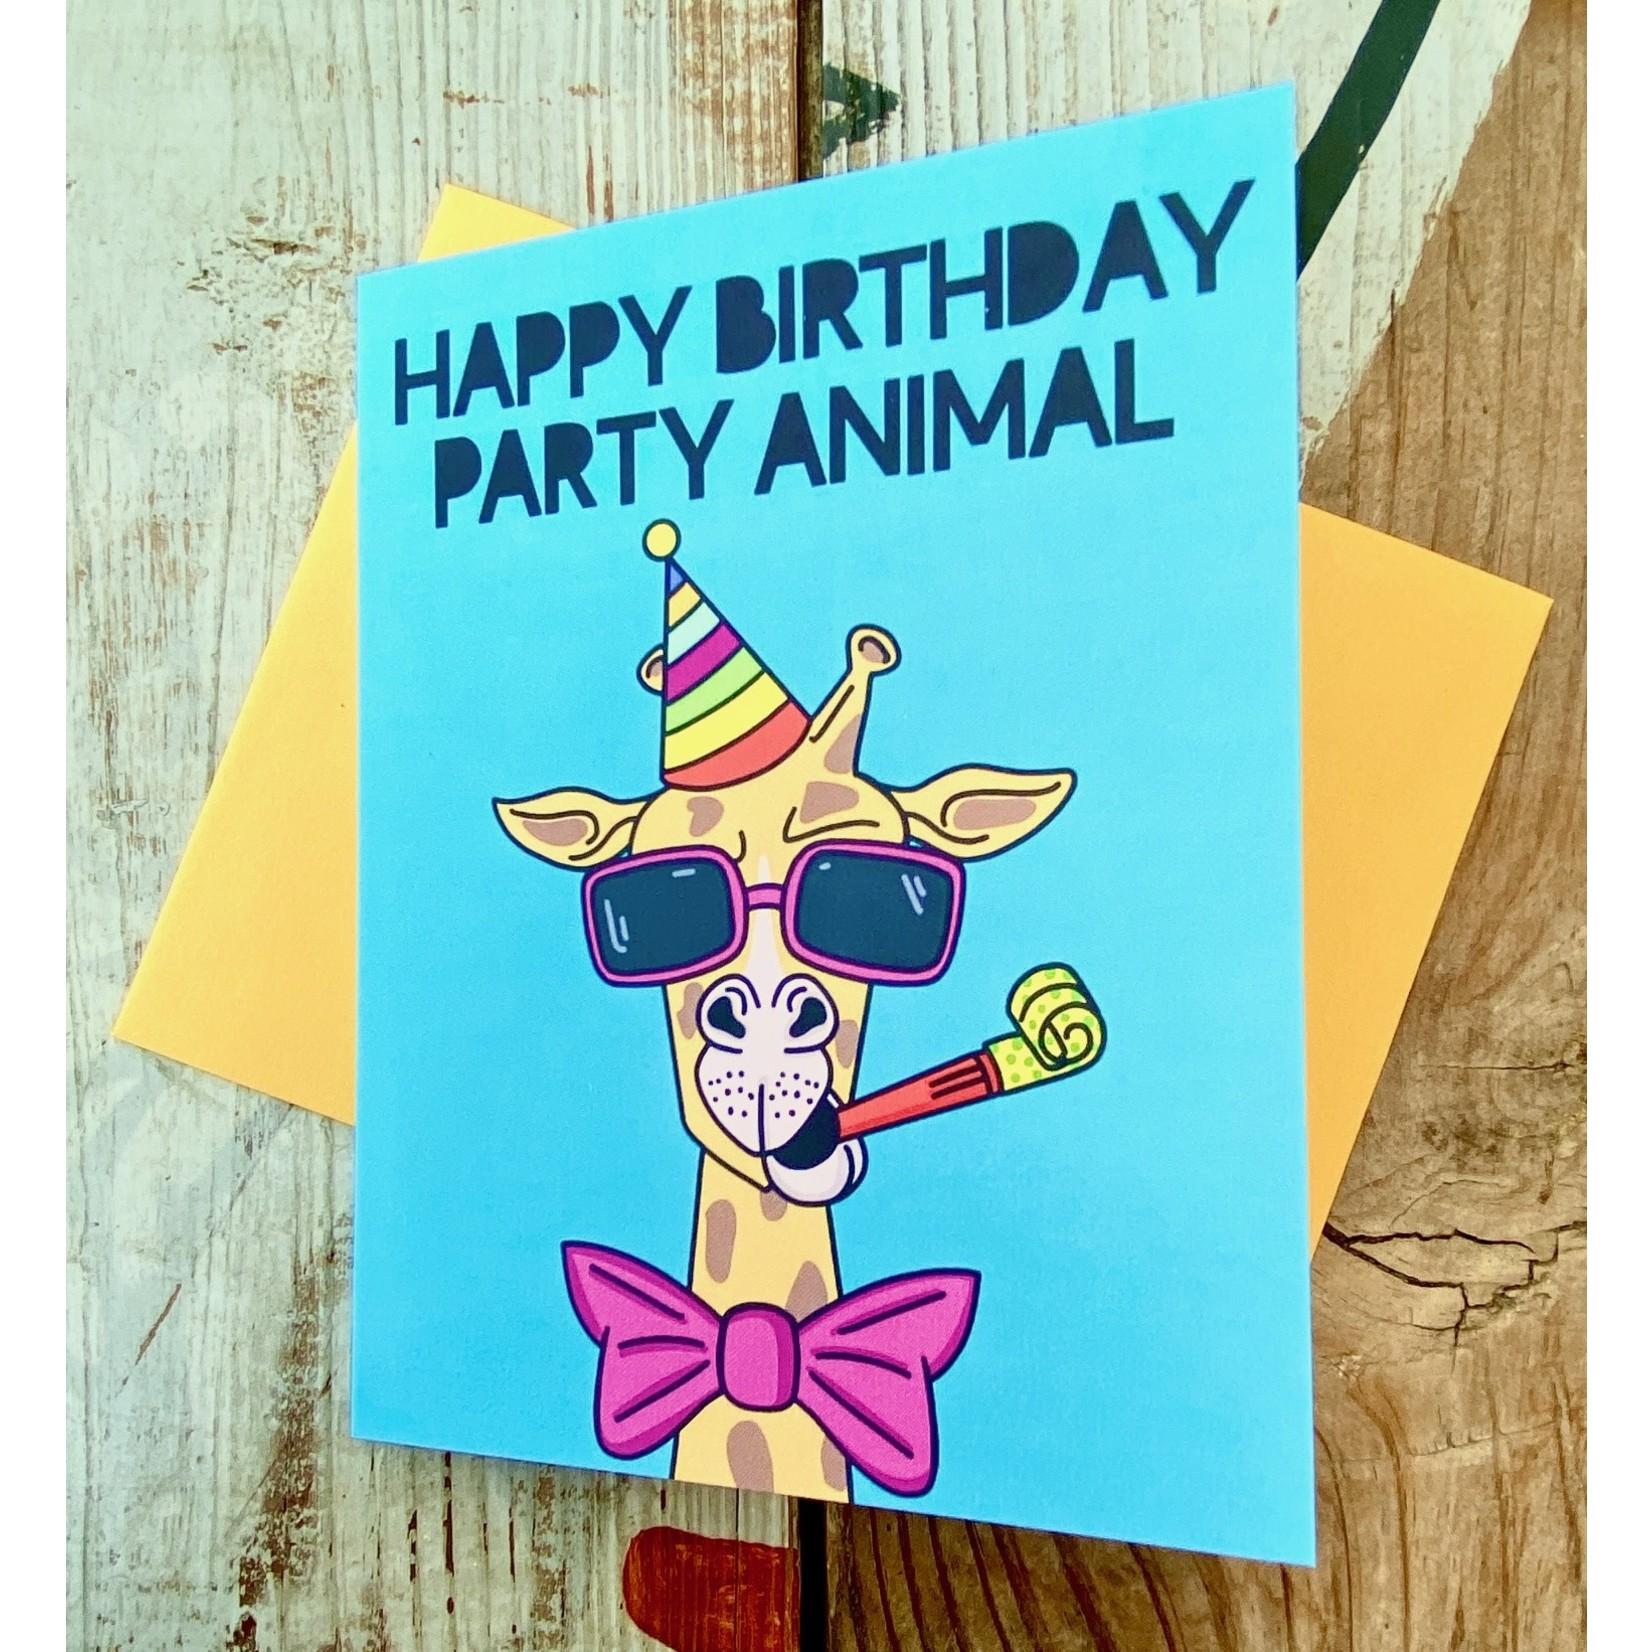 Fiber and Gloss Party Animal Giraffe Birthday Greeting Card